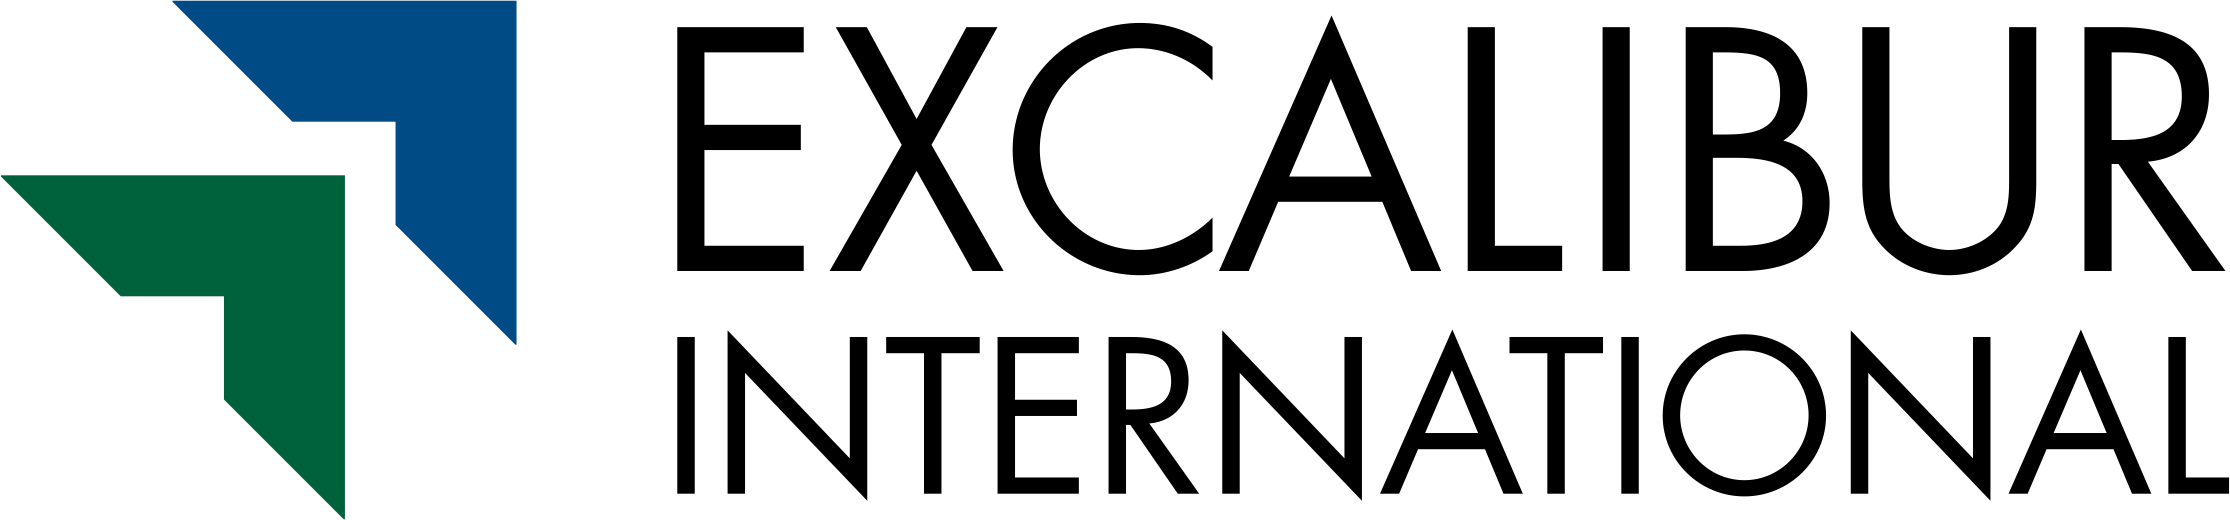 Excalibur International